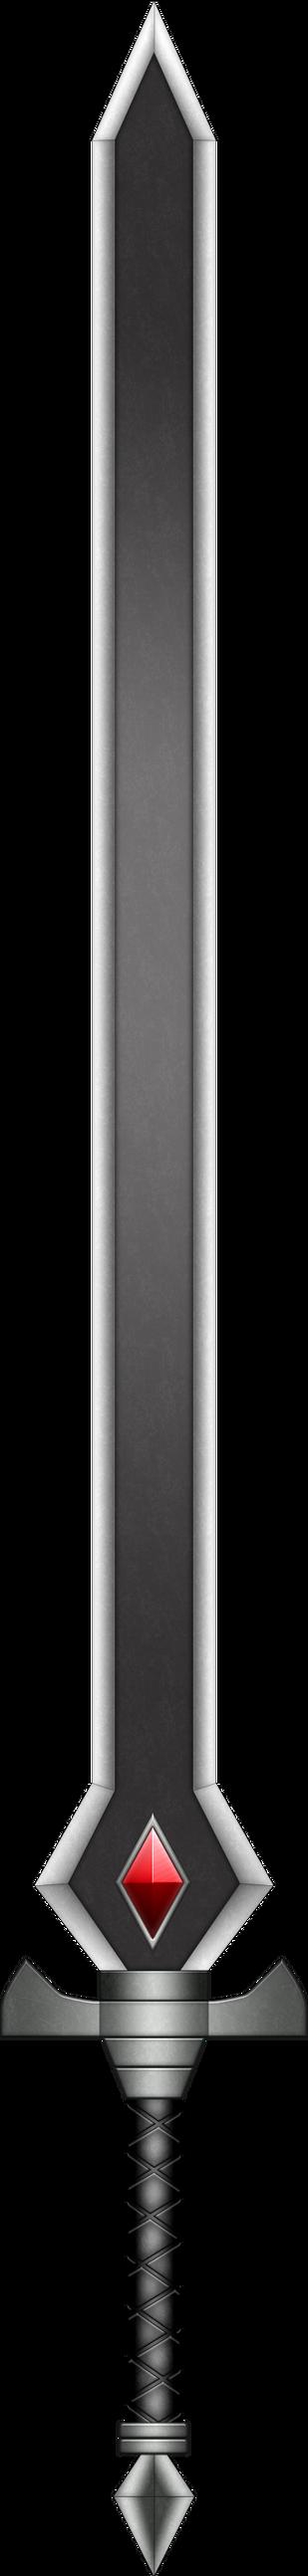 Ghirahim's Sword by BLUEamnesiac